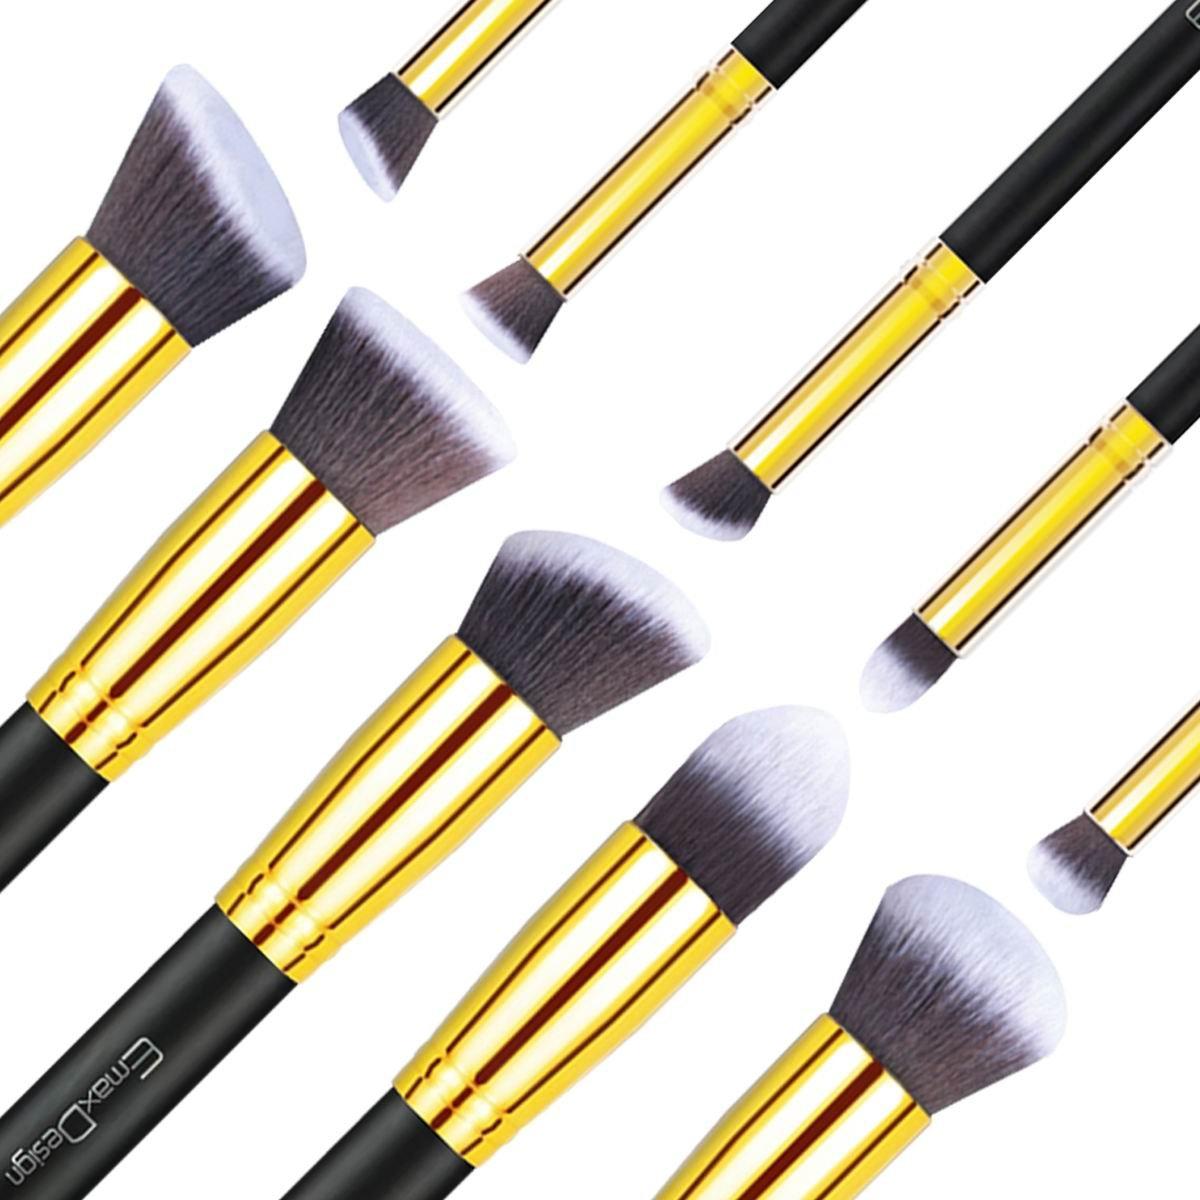 Juego de brochas de maquillaje kabuki por solo 10,99€